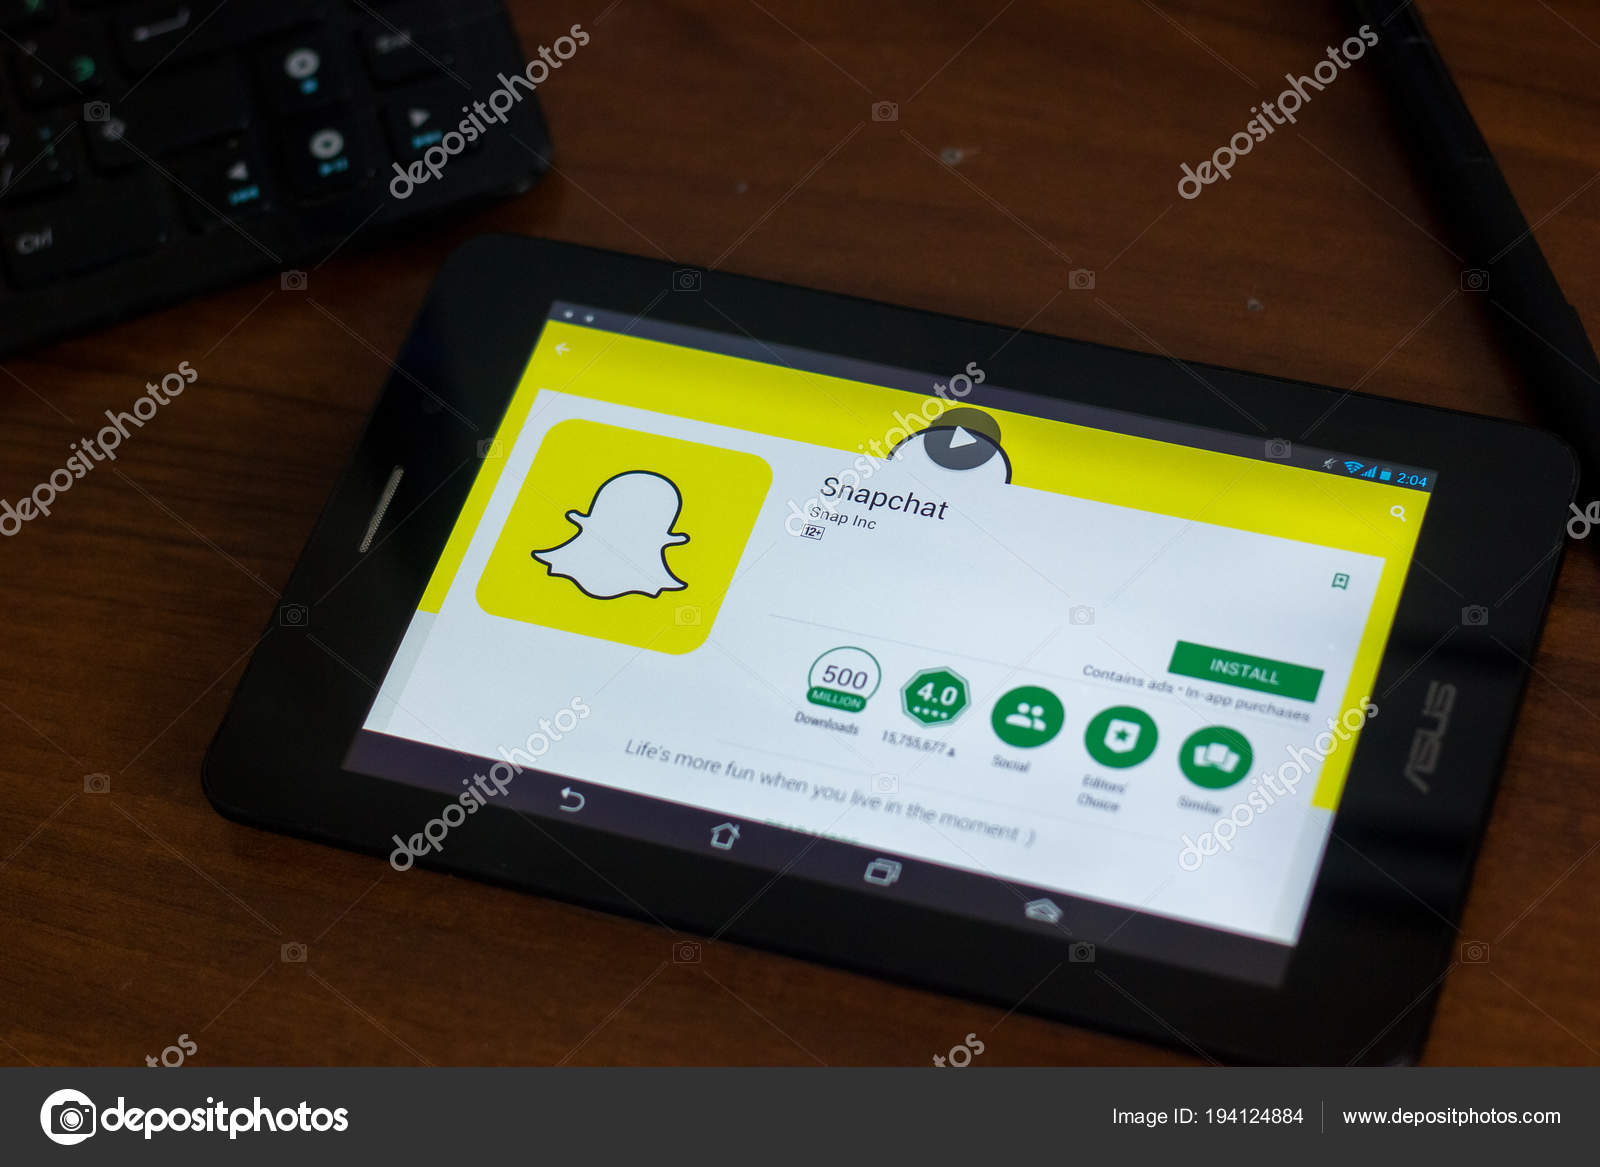 Ryazan Russia March 2018 Snapchat App Display Tablet – Stock